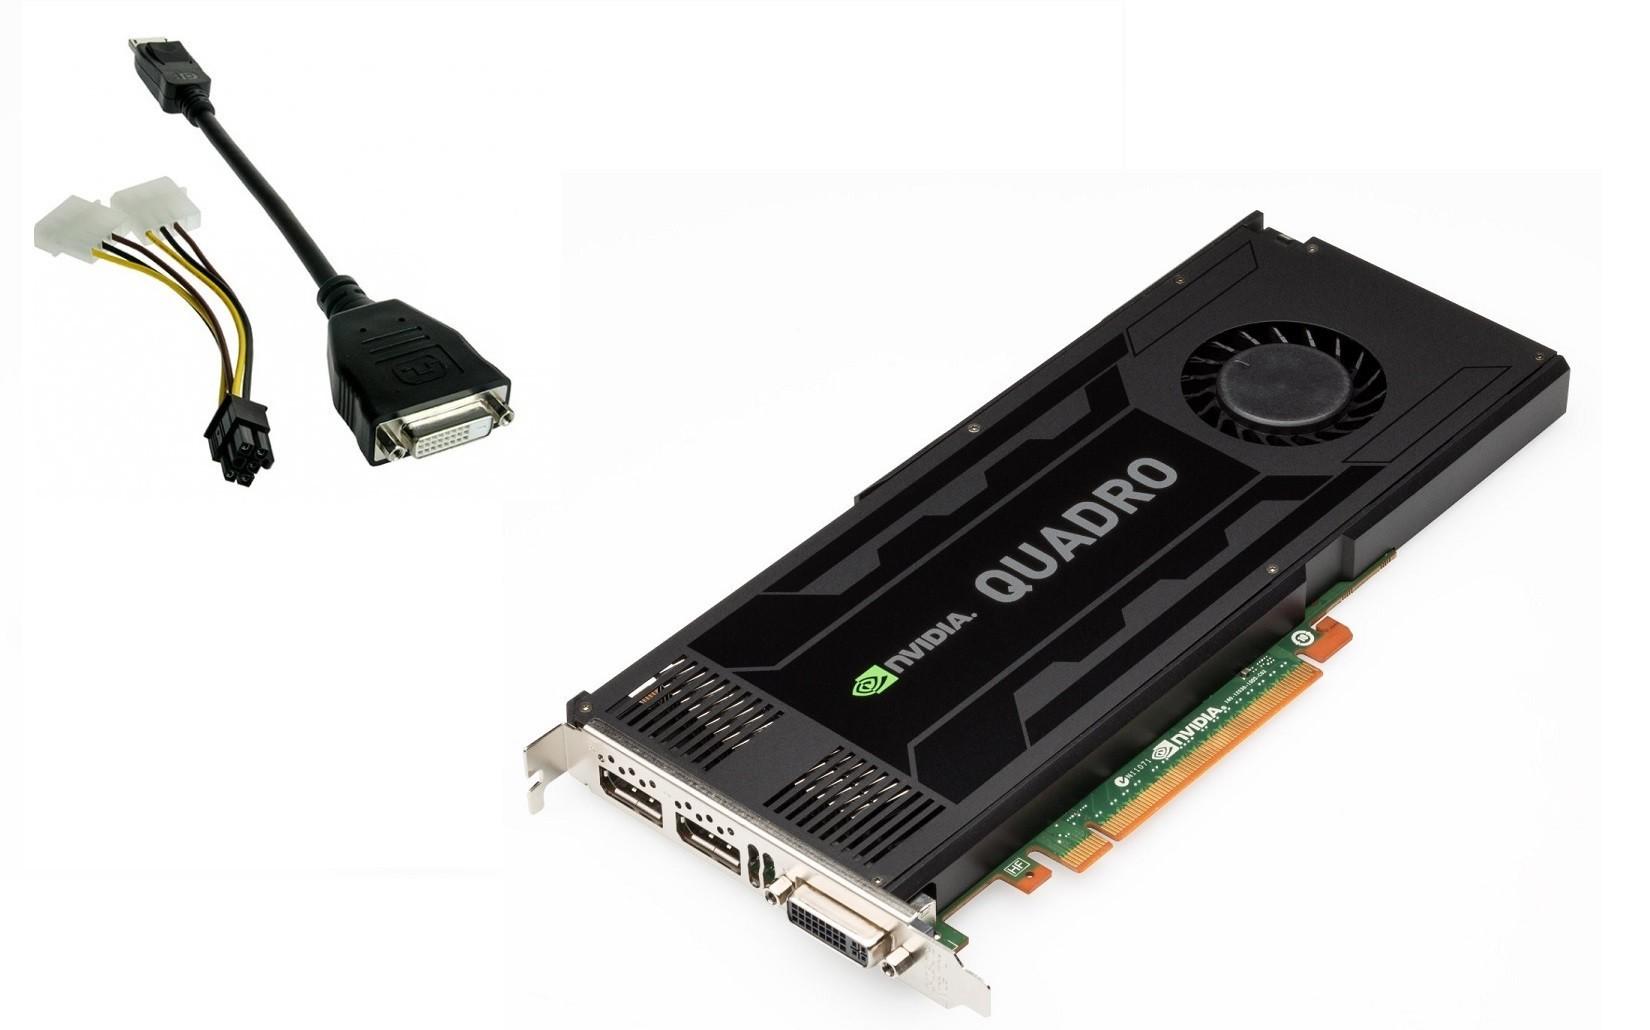 3GB Dell D5R4G nVIDIA Quadro K4000 DVI-I 2x Display Ports GDDR5 PCI Express 2.0 x16 Graphic Card D5R4G